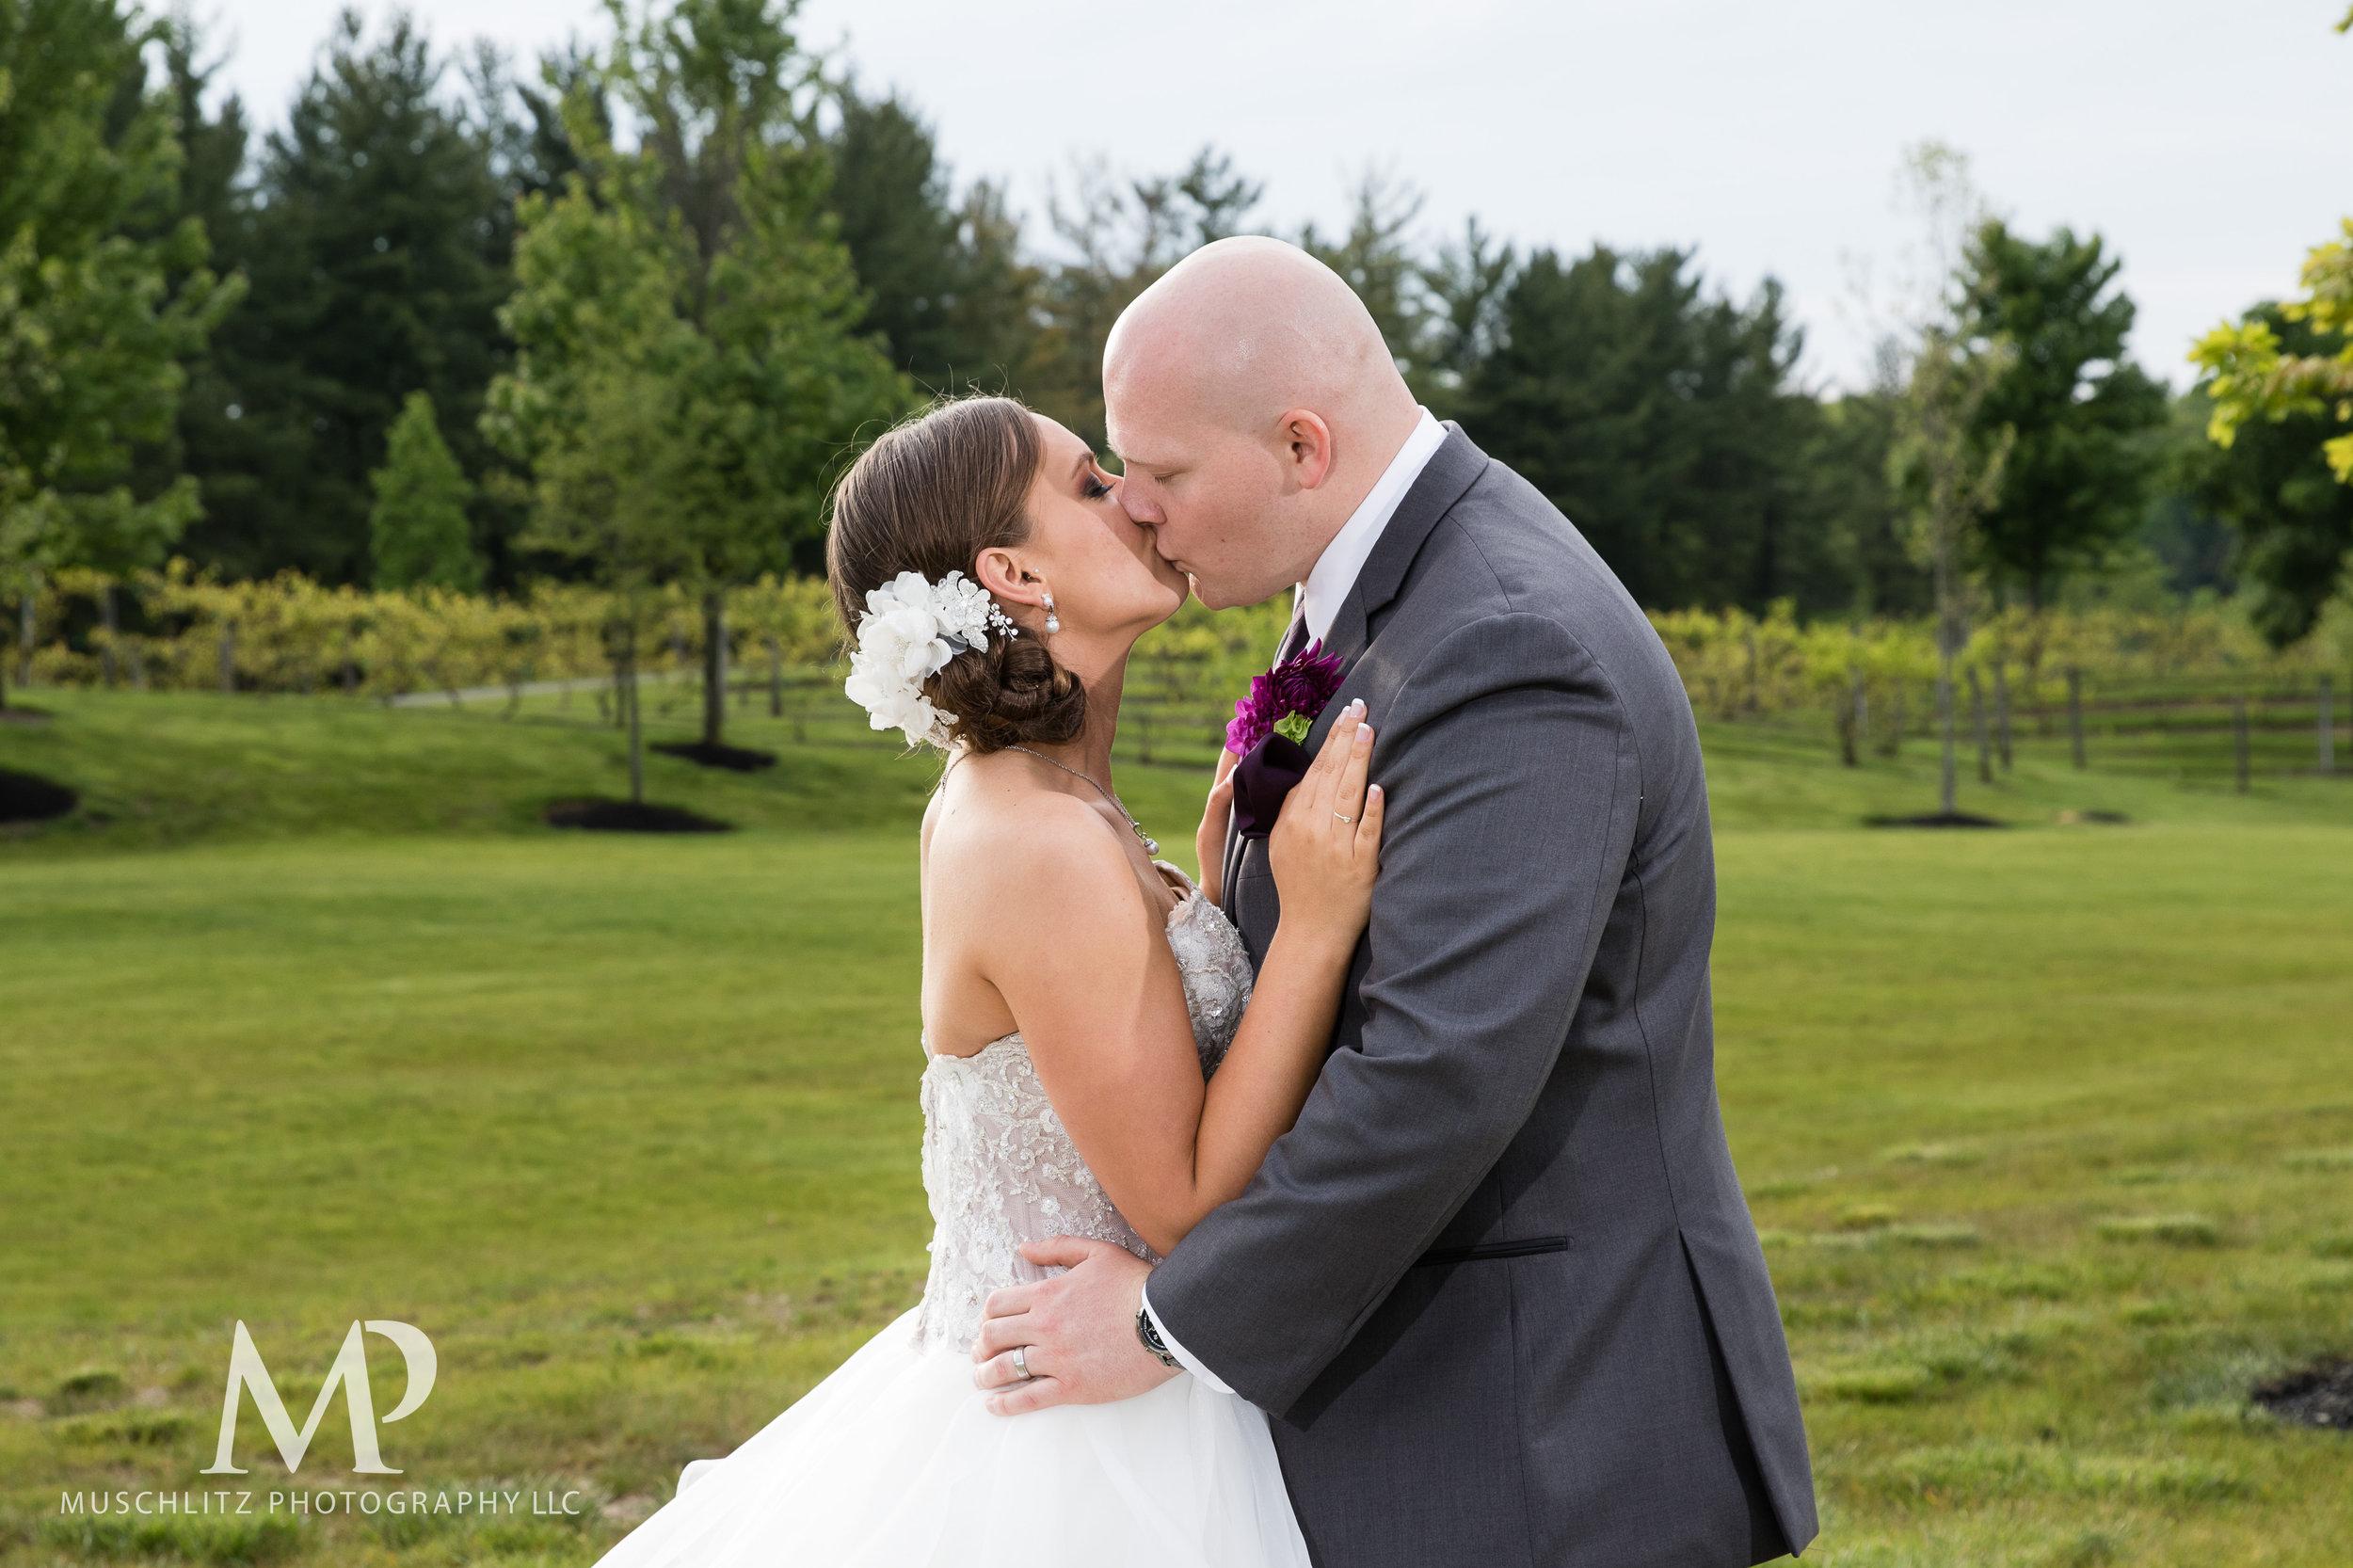 club-at-corazon-wedding-ceremony-reception-columbus-dublin-ohio-ohio-university-theme-059.JPG